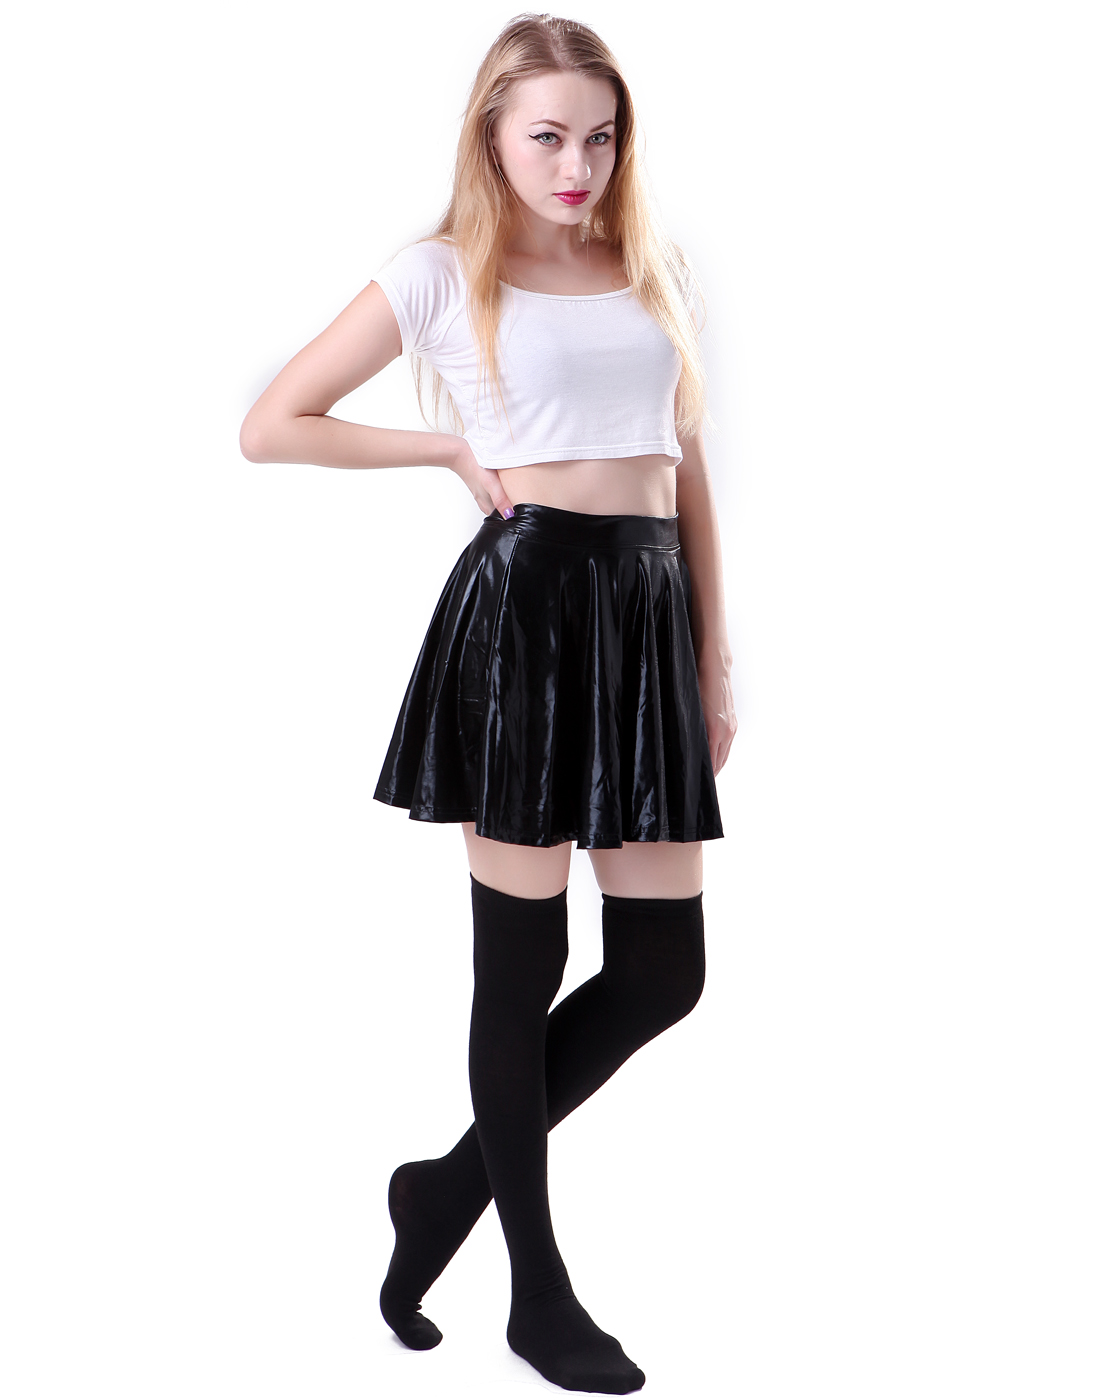 Girls Plain Knee High Long Every School Socks